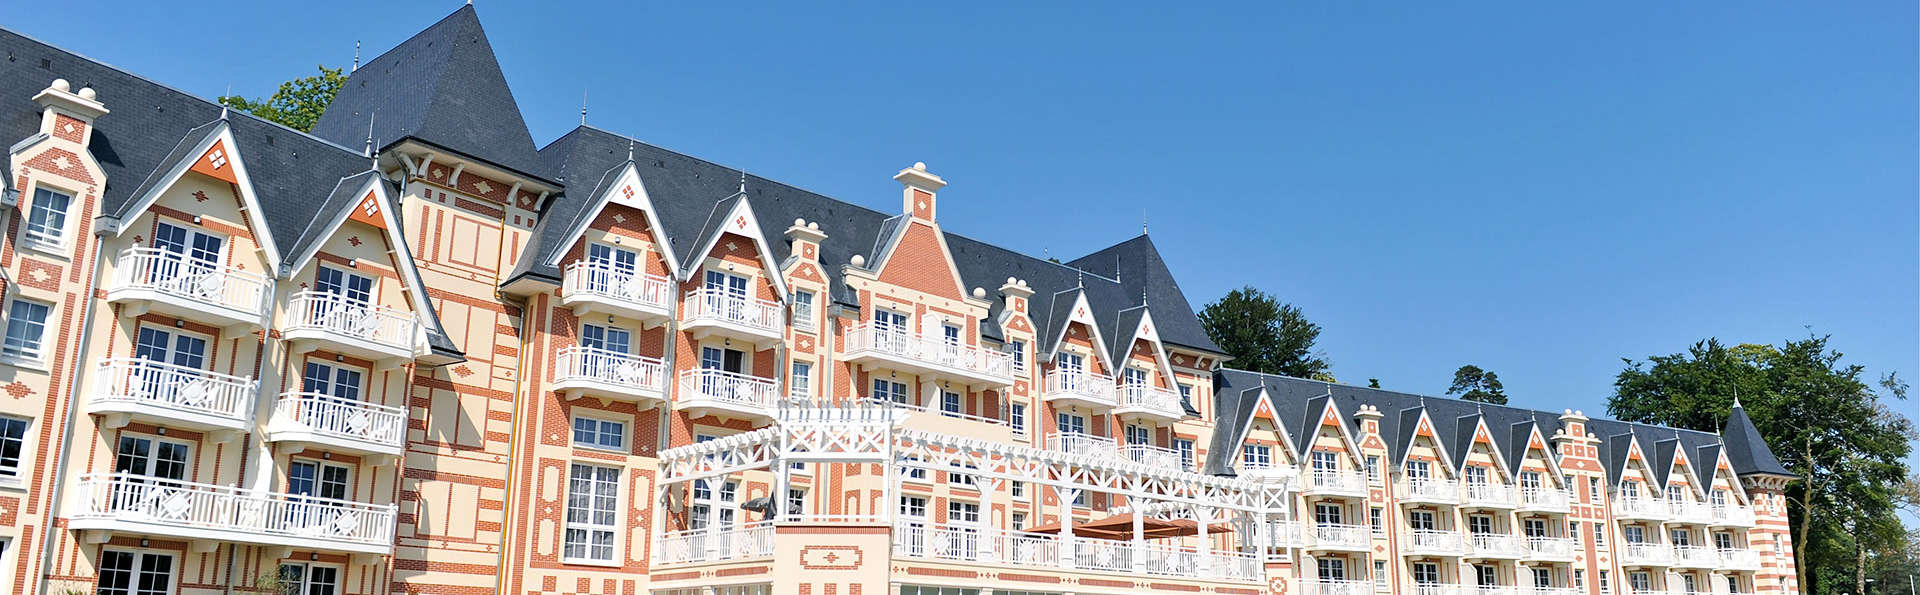 B'O resort Bagnoles de l'Orne - Edit_Front3.jpg